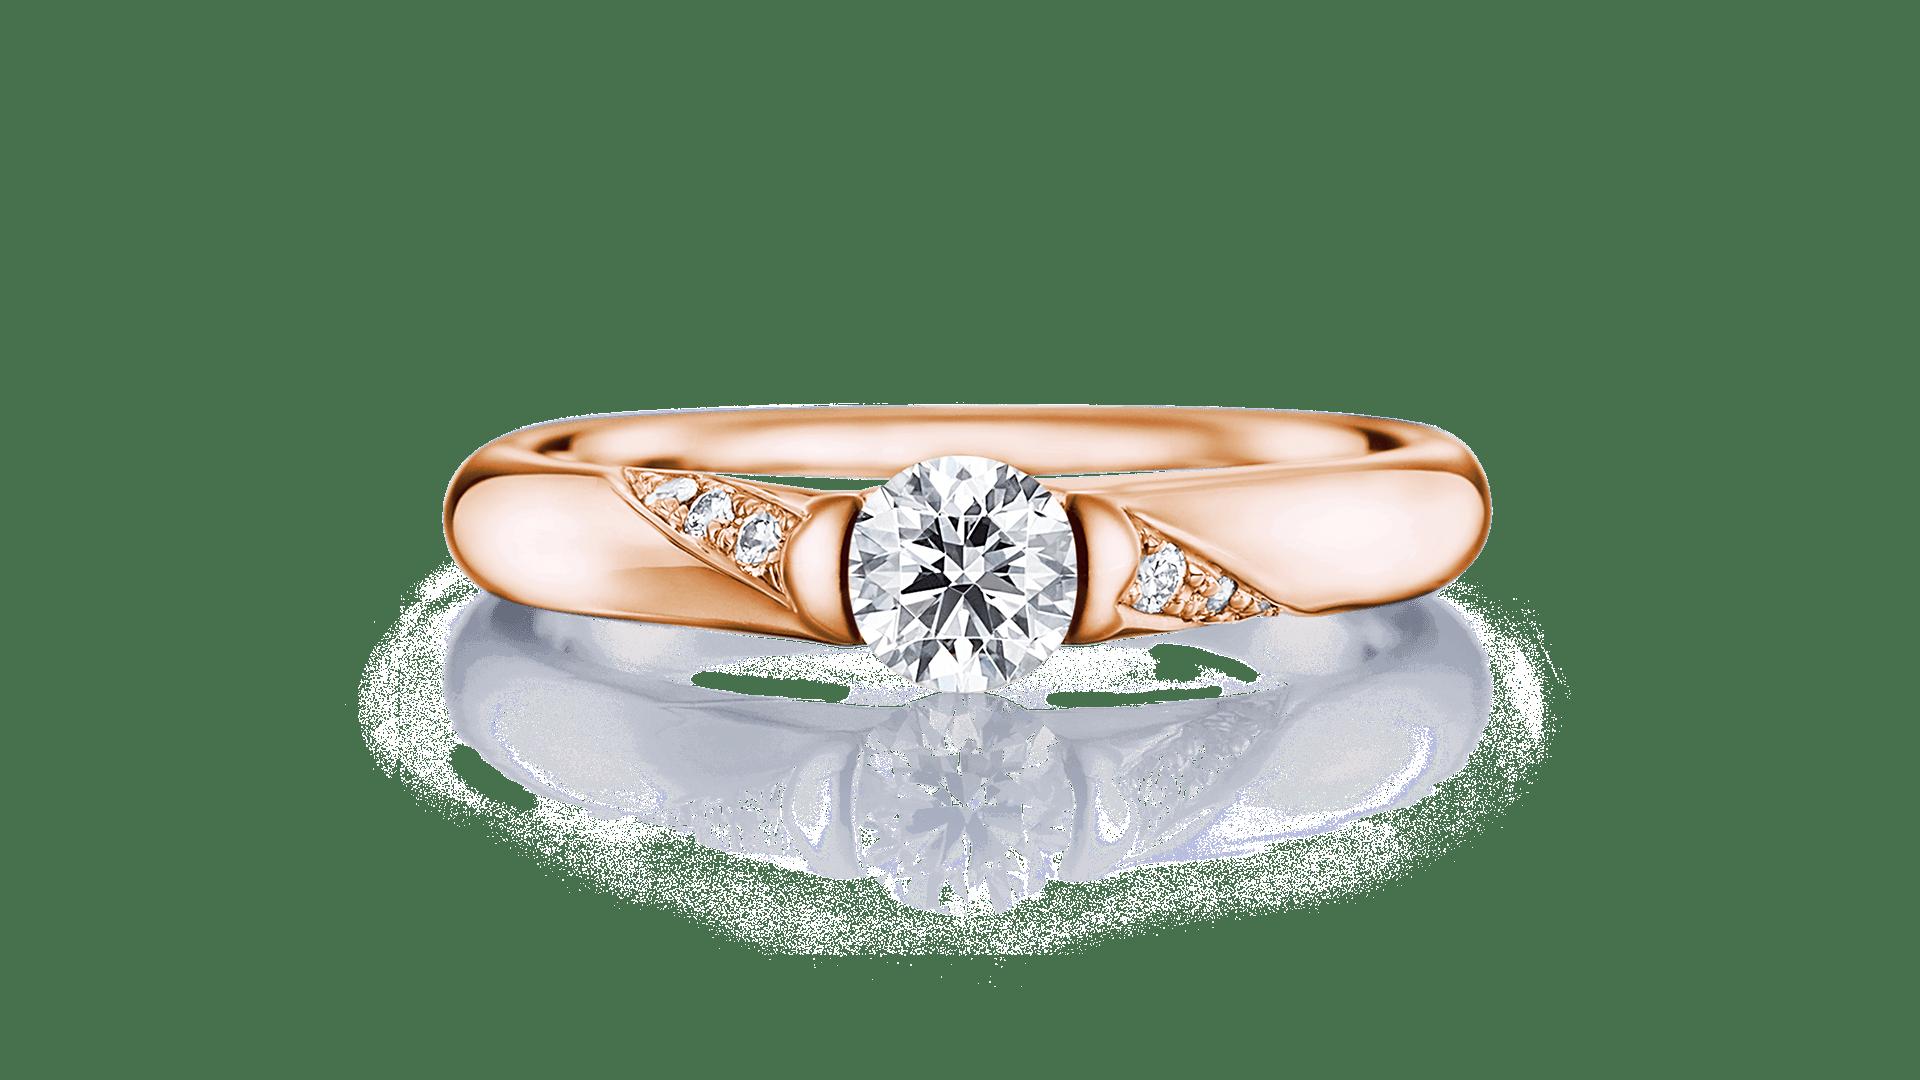 acrux アクルクス | 婚約指輪サムネイル 1